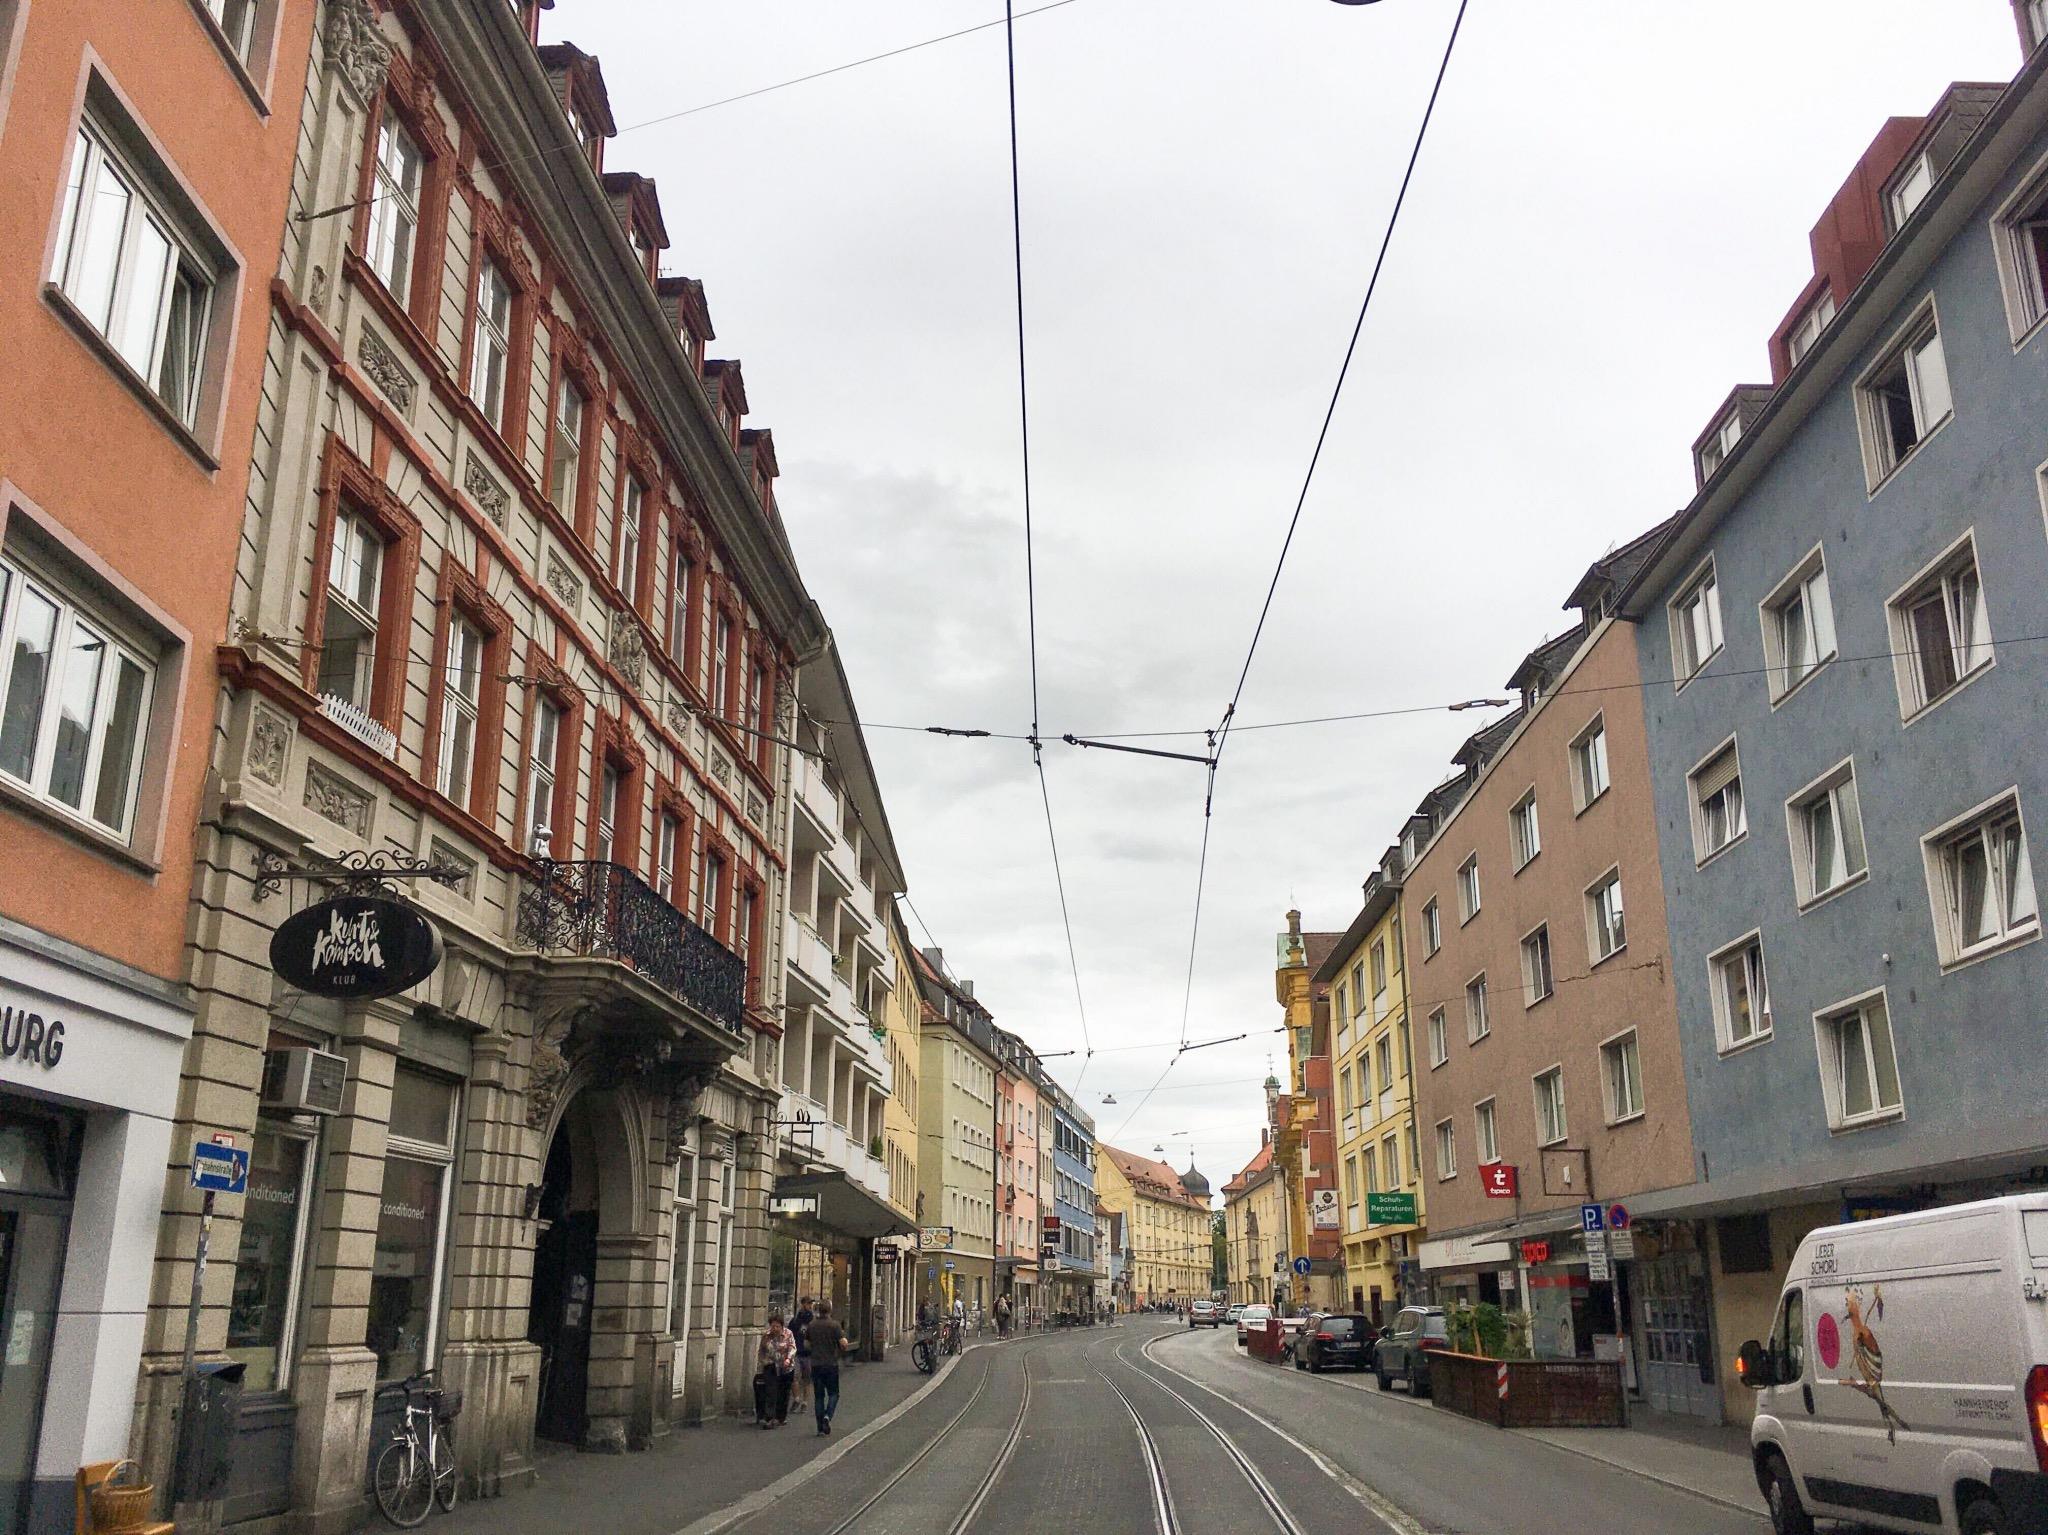 Blick in Sanderstraße, Symbolbild. Foto: Jacob Grimm